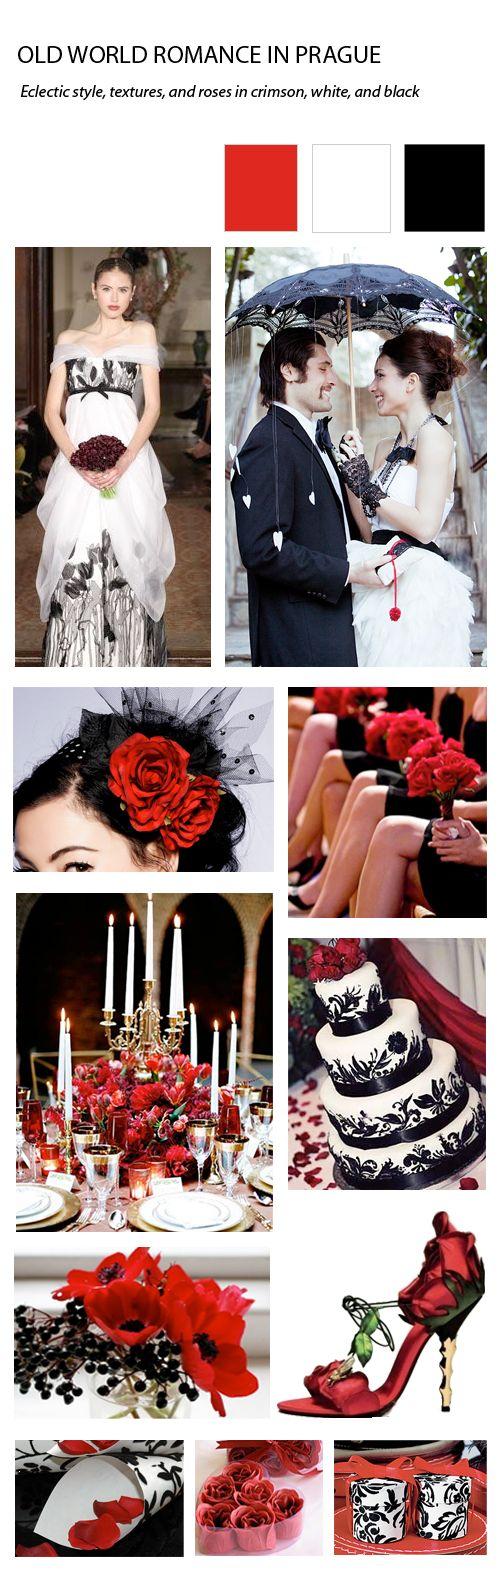 Red and Black Prague Wedding